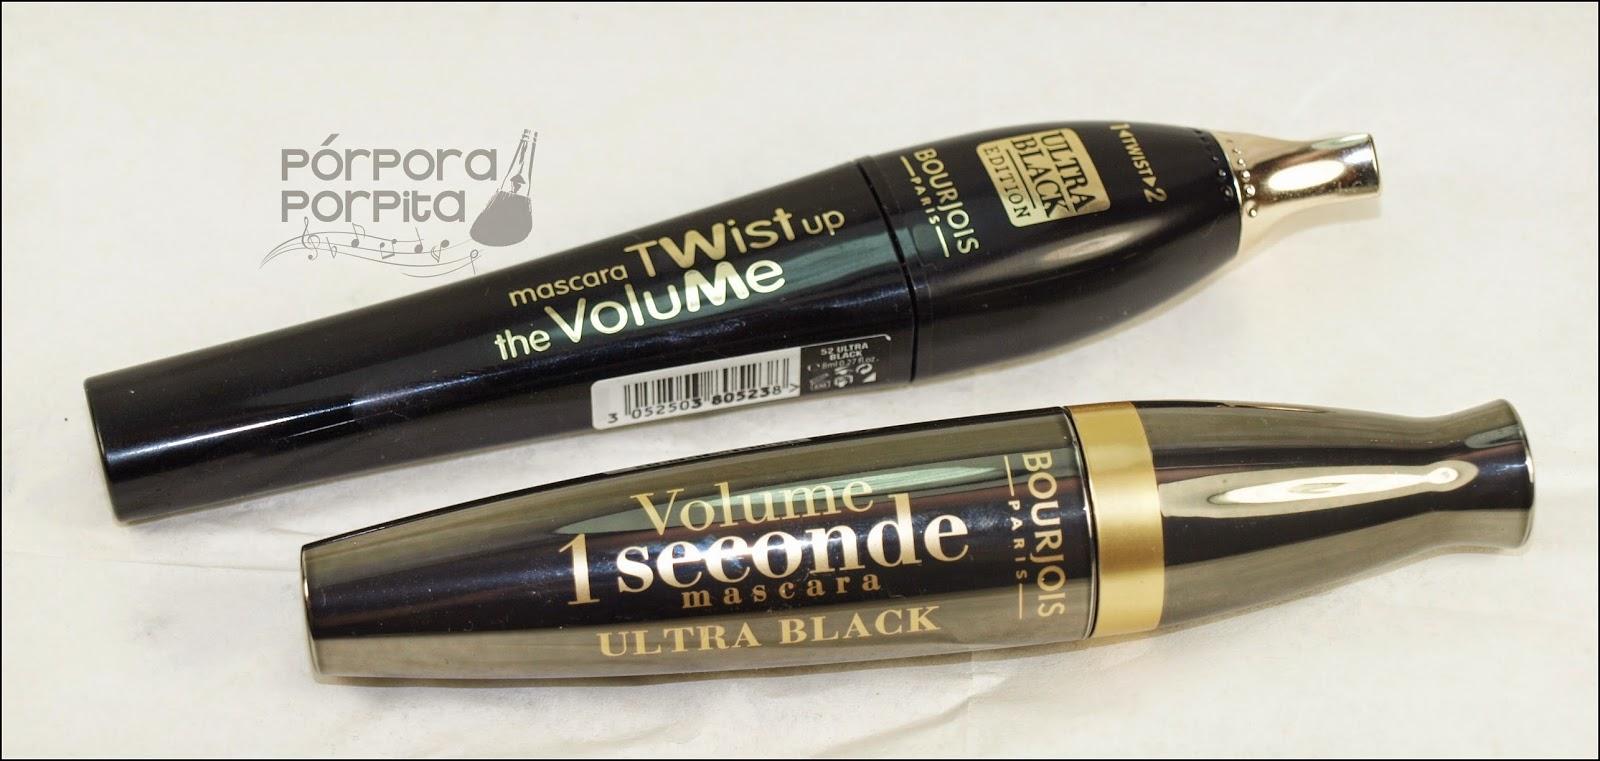 Coleccin Ultra Black De Bourjois Prpora Porpita Eyeliner Liner Stylo 61 Twist Up The Volume Edition